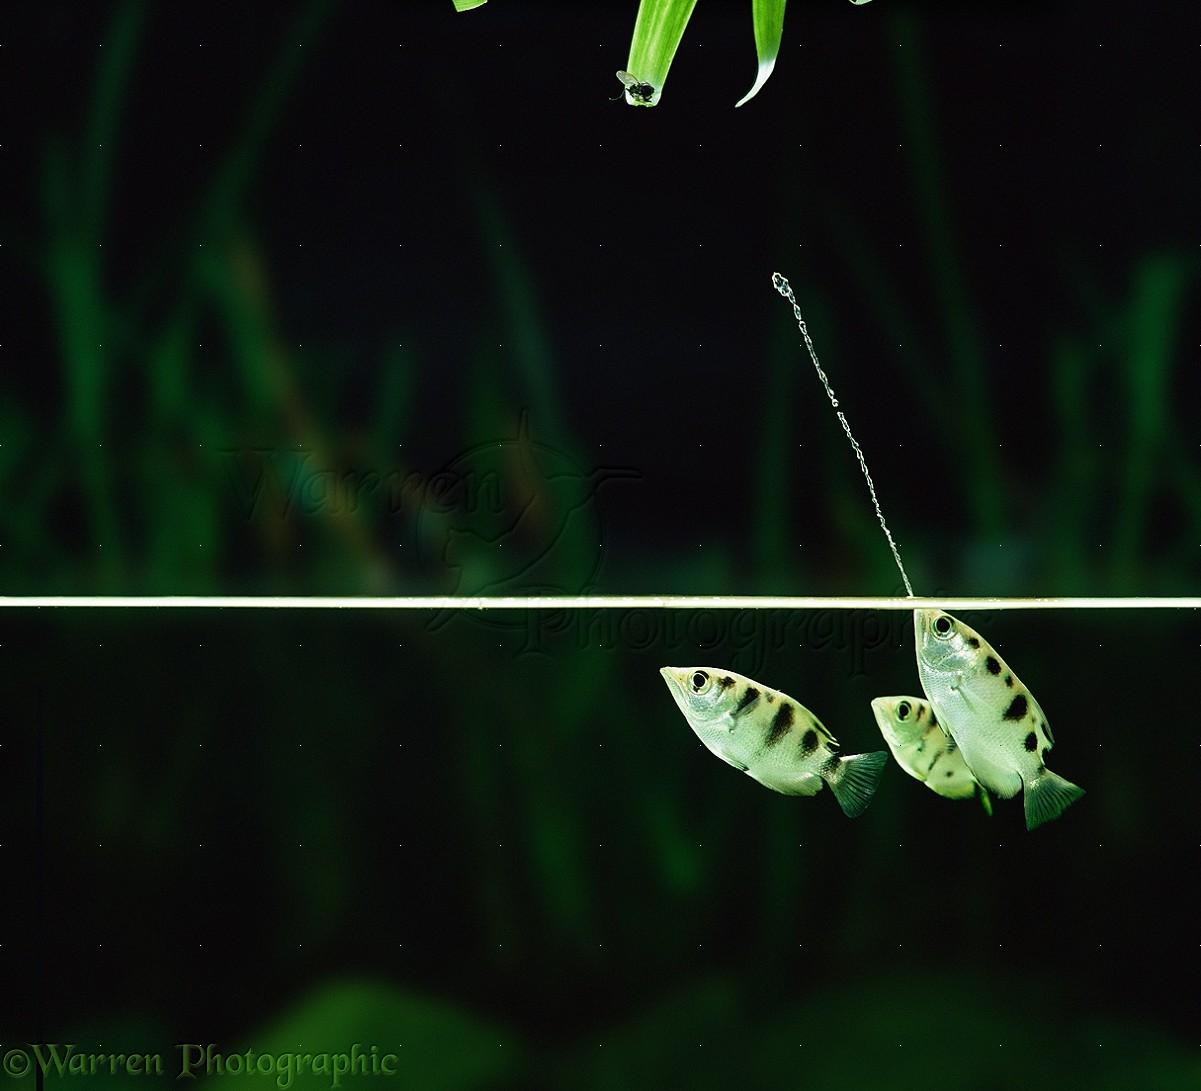 Archer Fish jetting water photo - WP11509